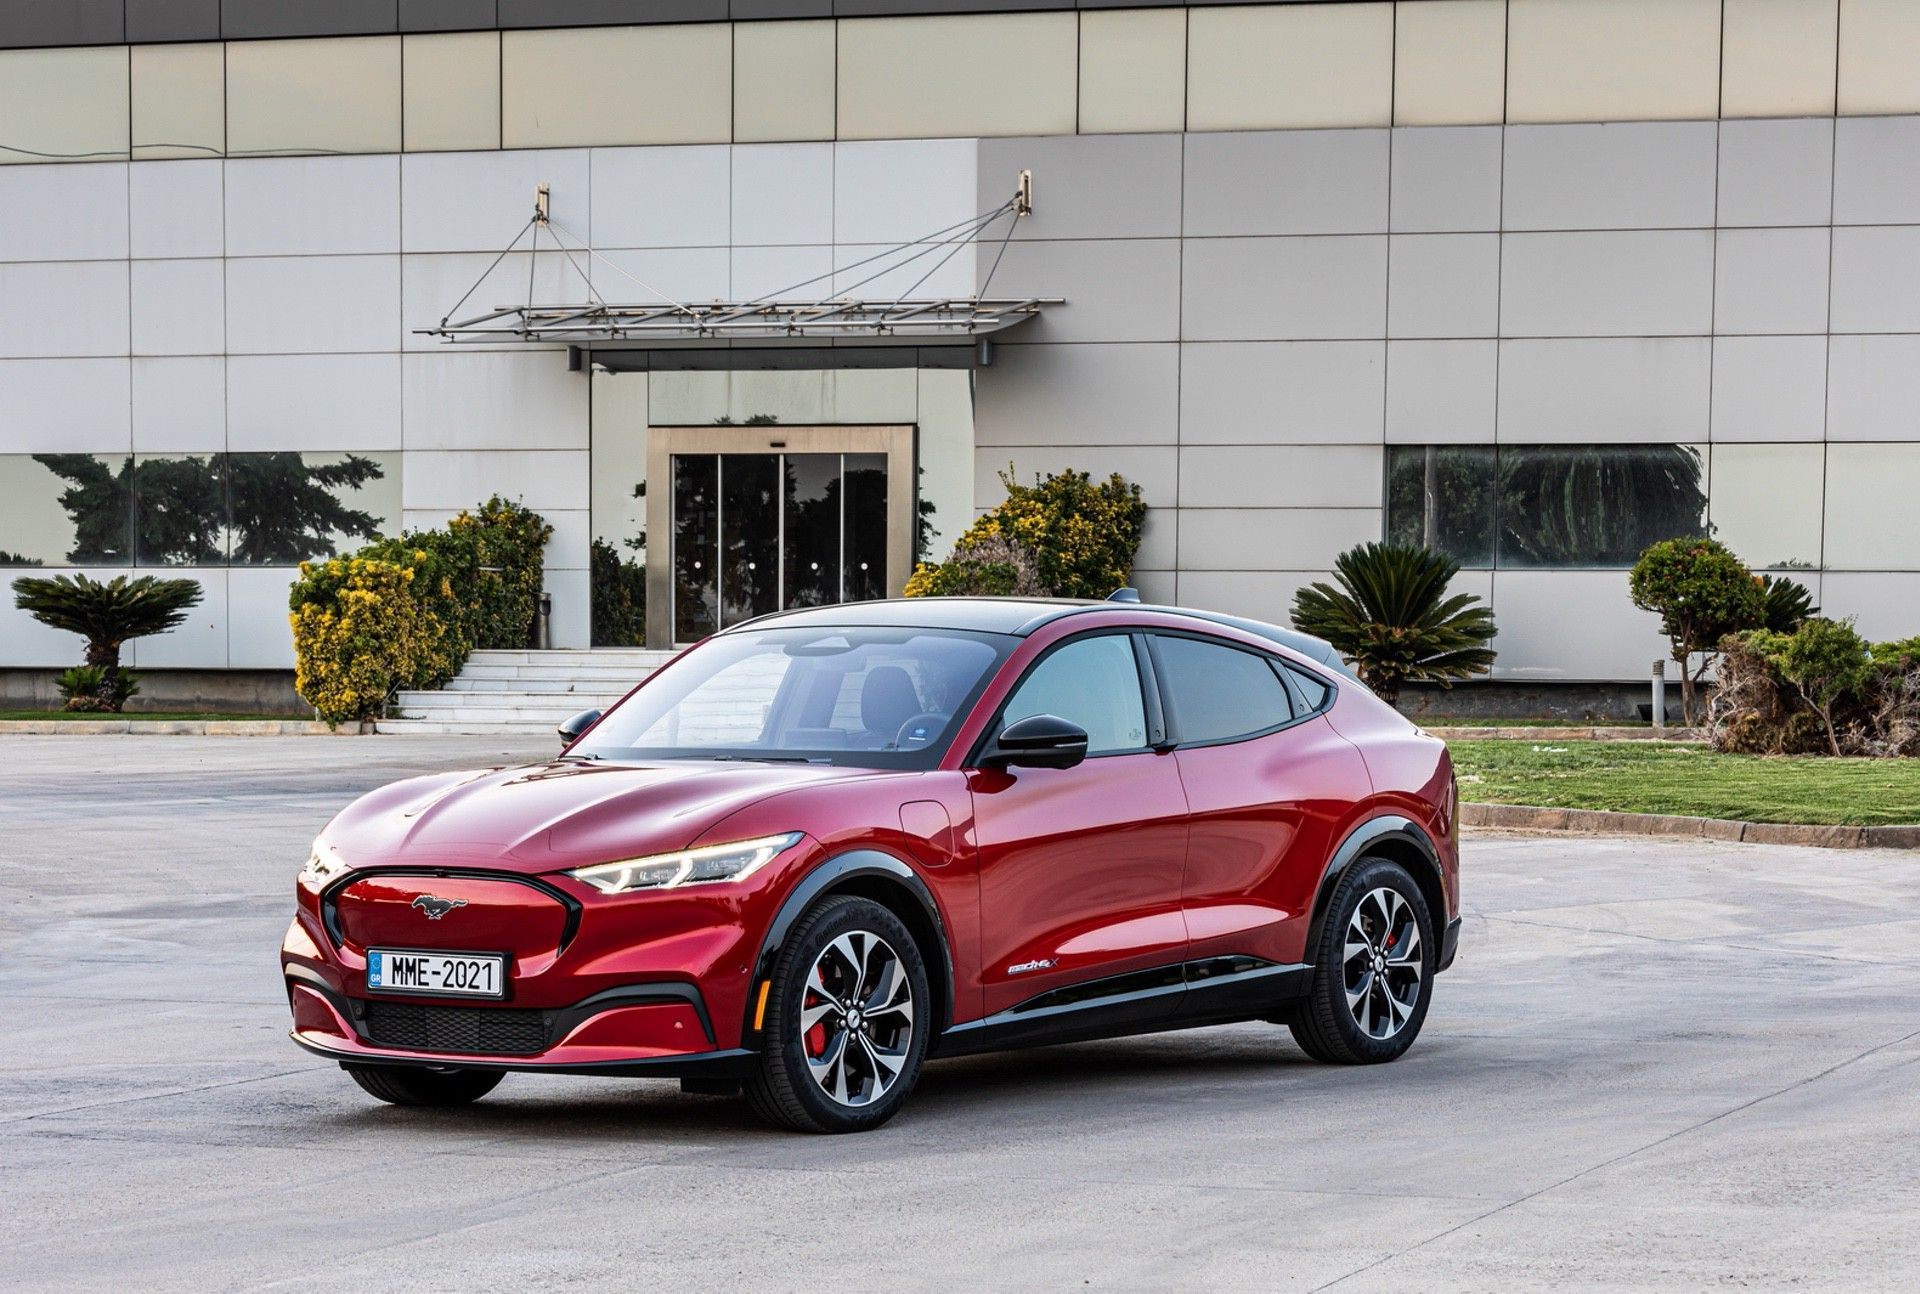 Ford_Mustang_Mach-E_greek_presskit-0030